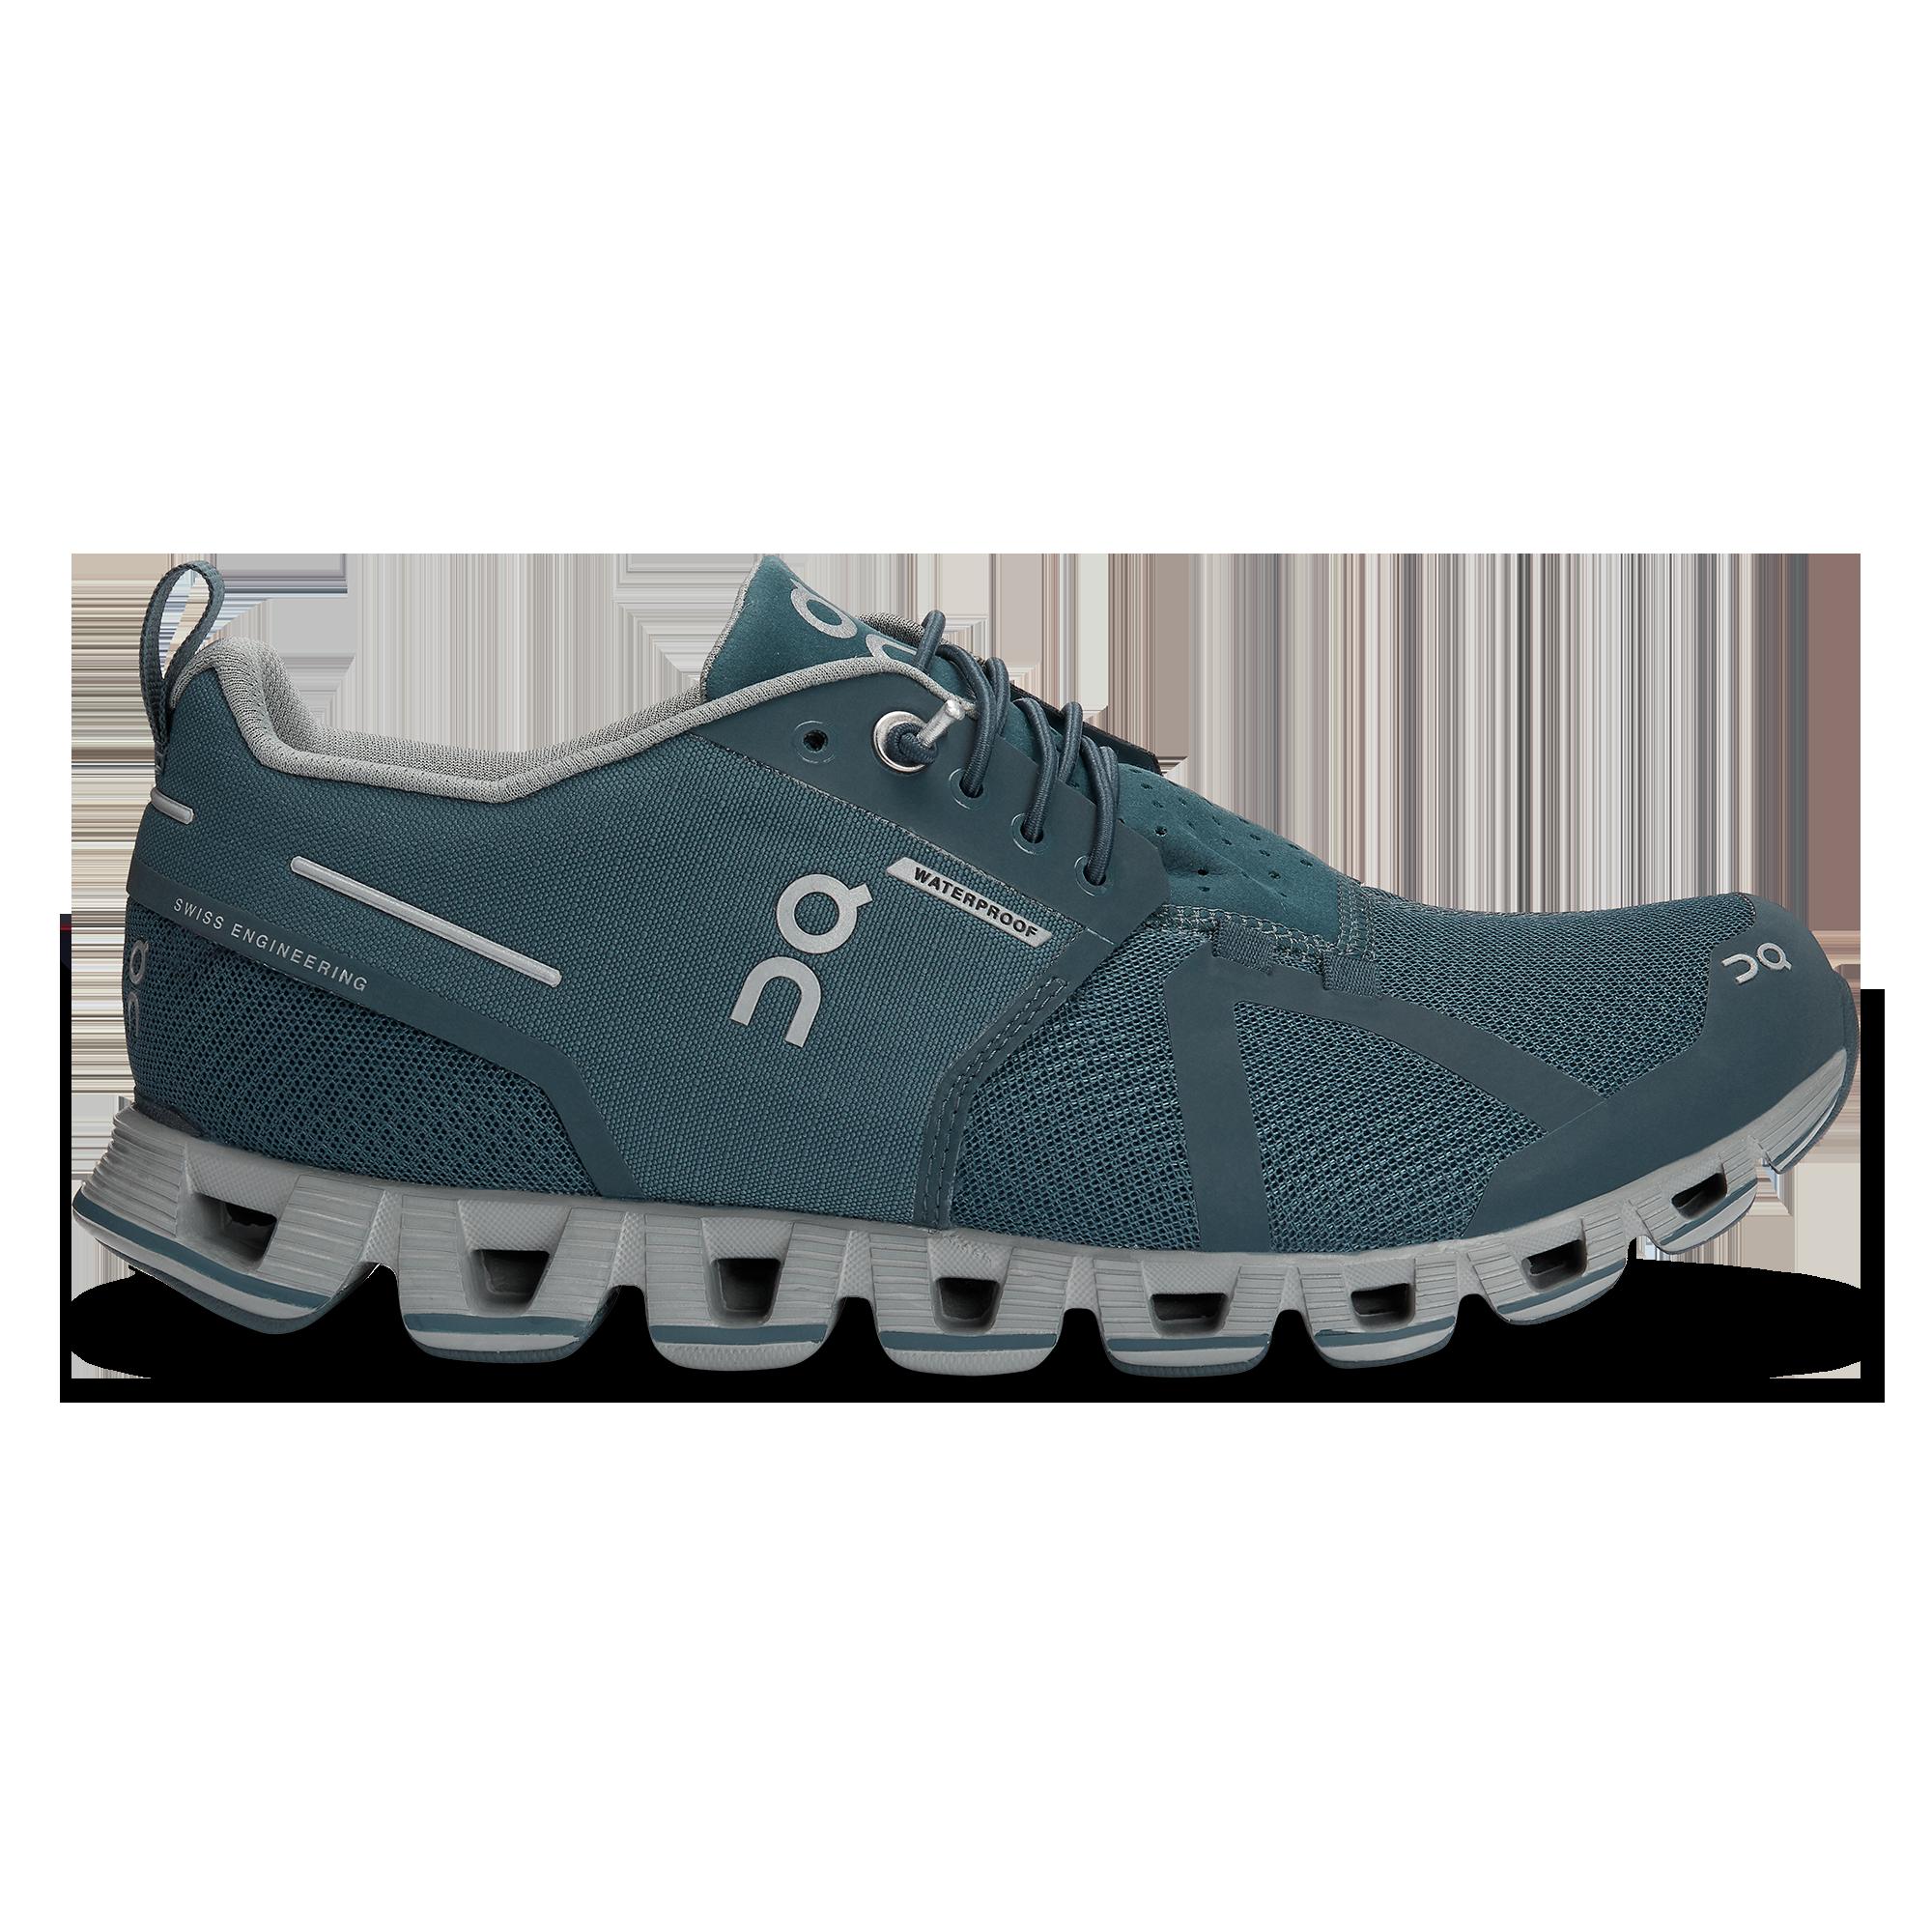 33++ On cloud tennis shoes ideas ideas